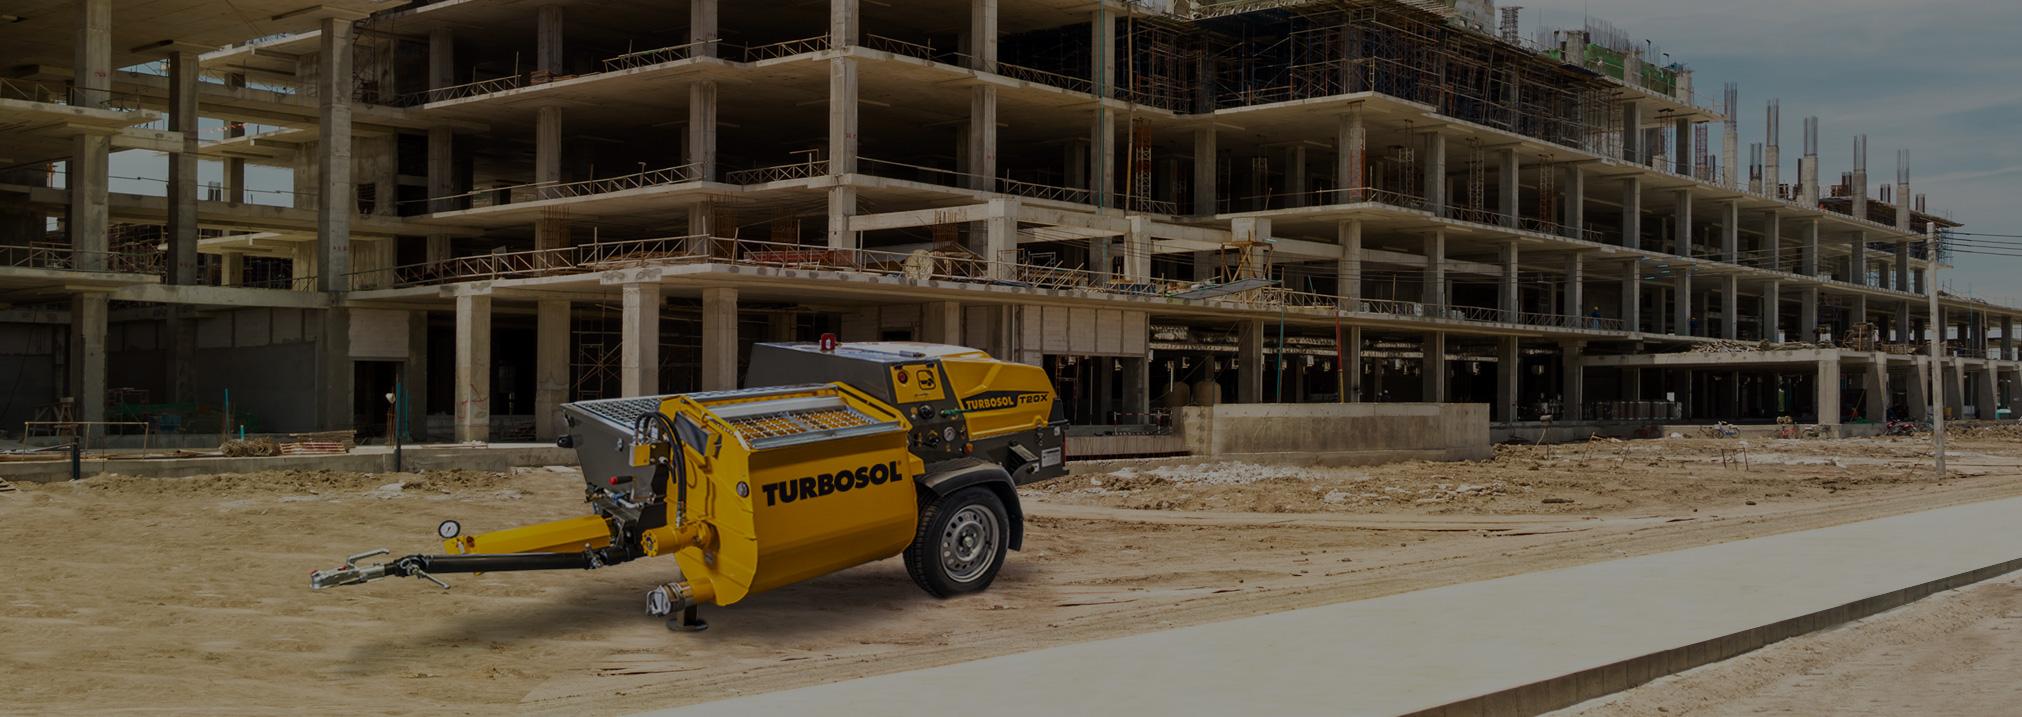 turbosol concrete 2019 1